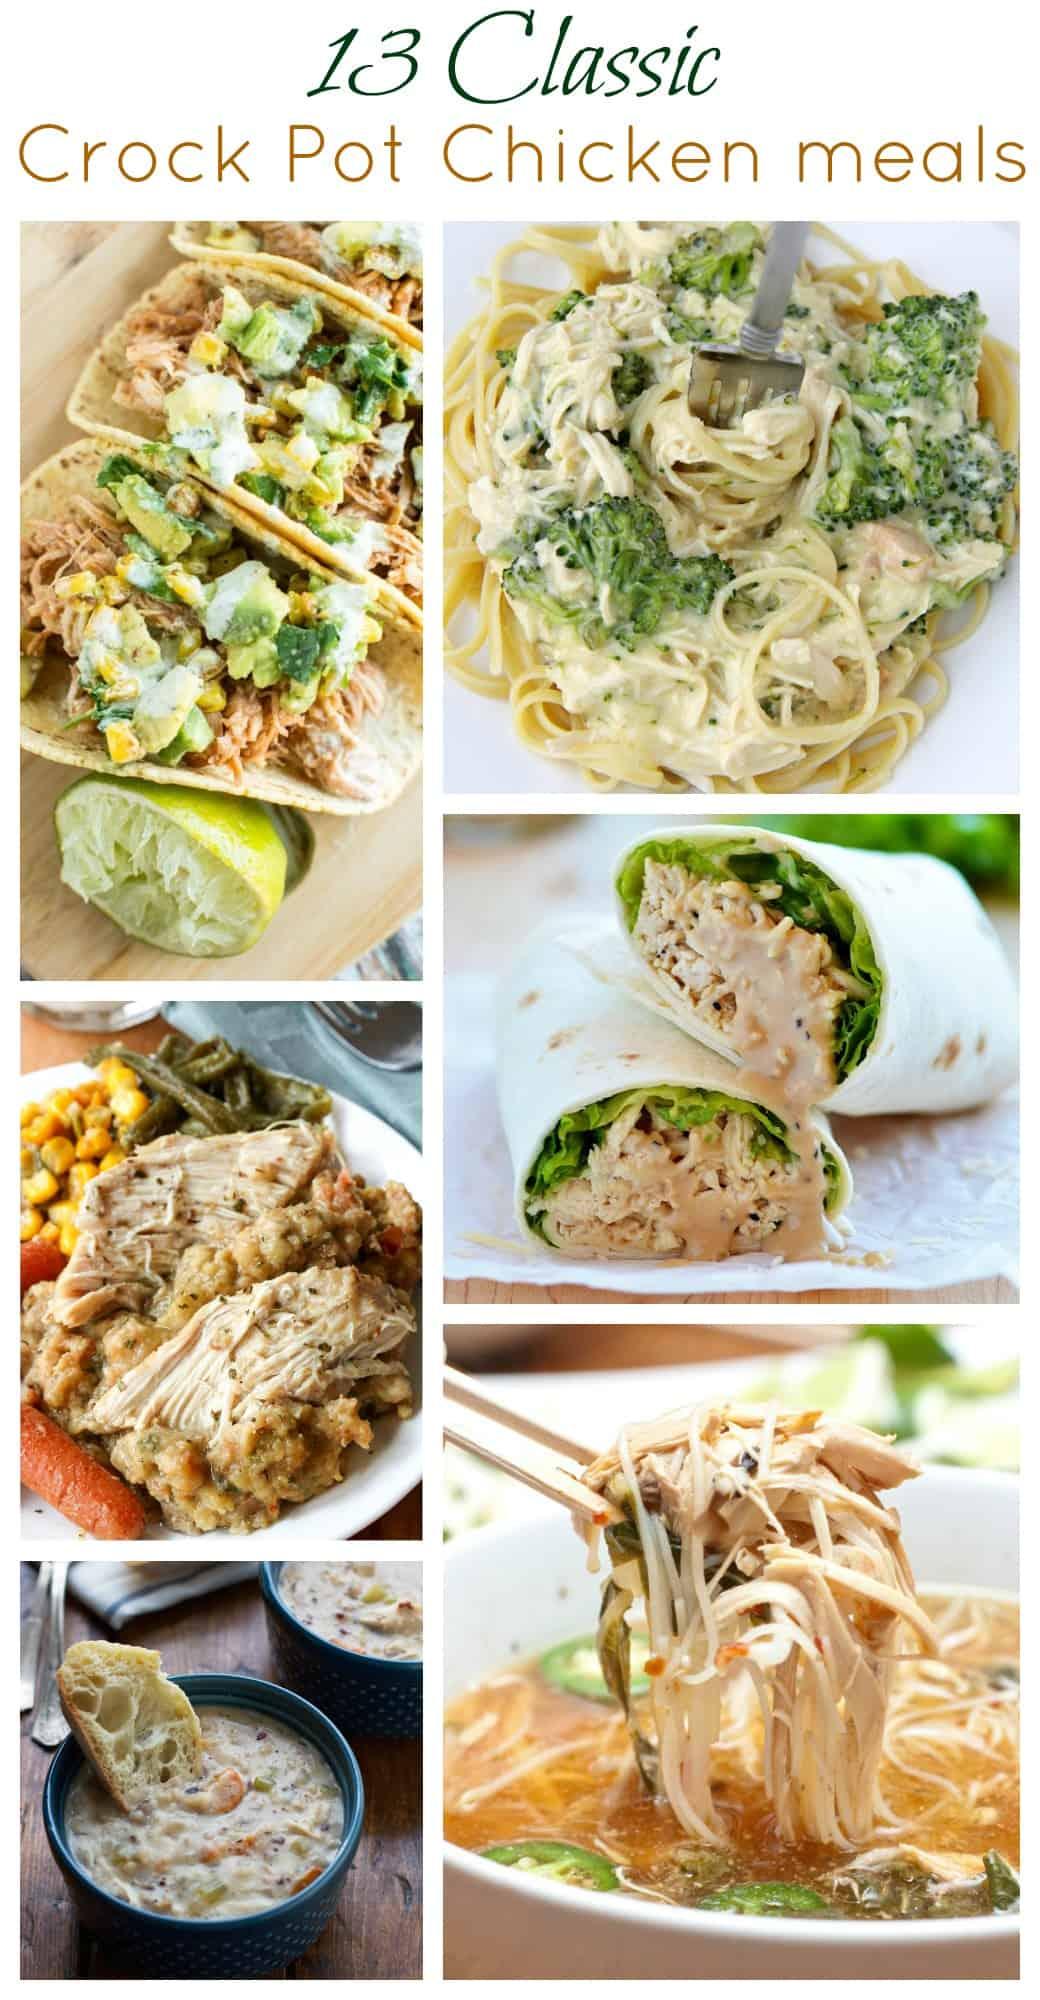 13-Classic-Crock-Pot-Chicken-Meals